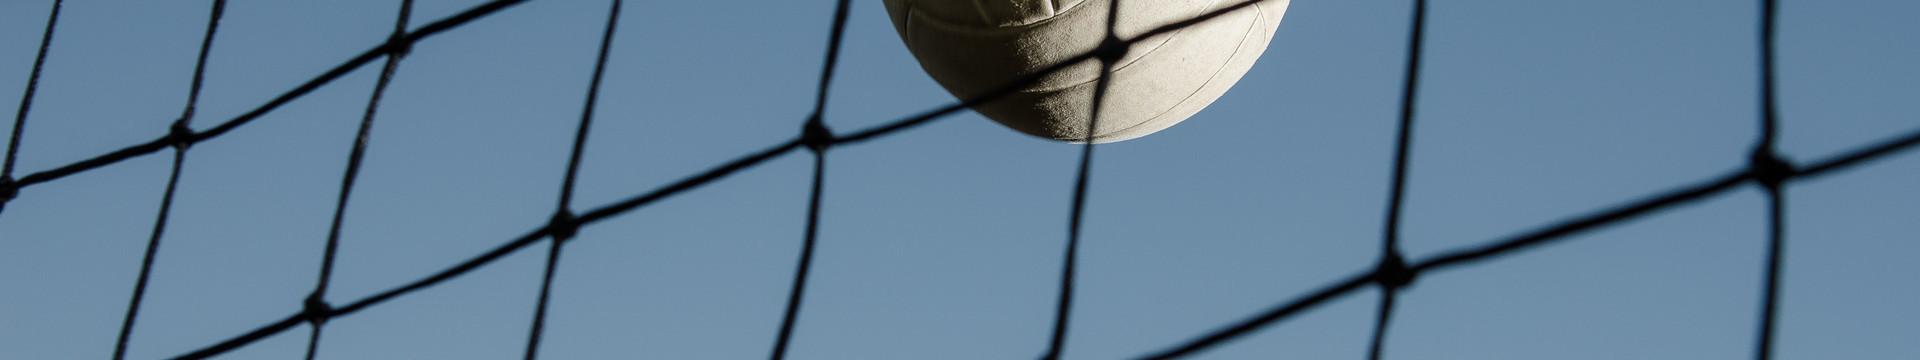 Sand Beach Volleyball Courts in Orlando, FL | Westgate Lakes Resort & Spa